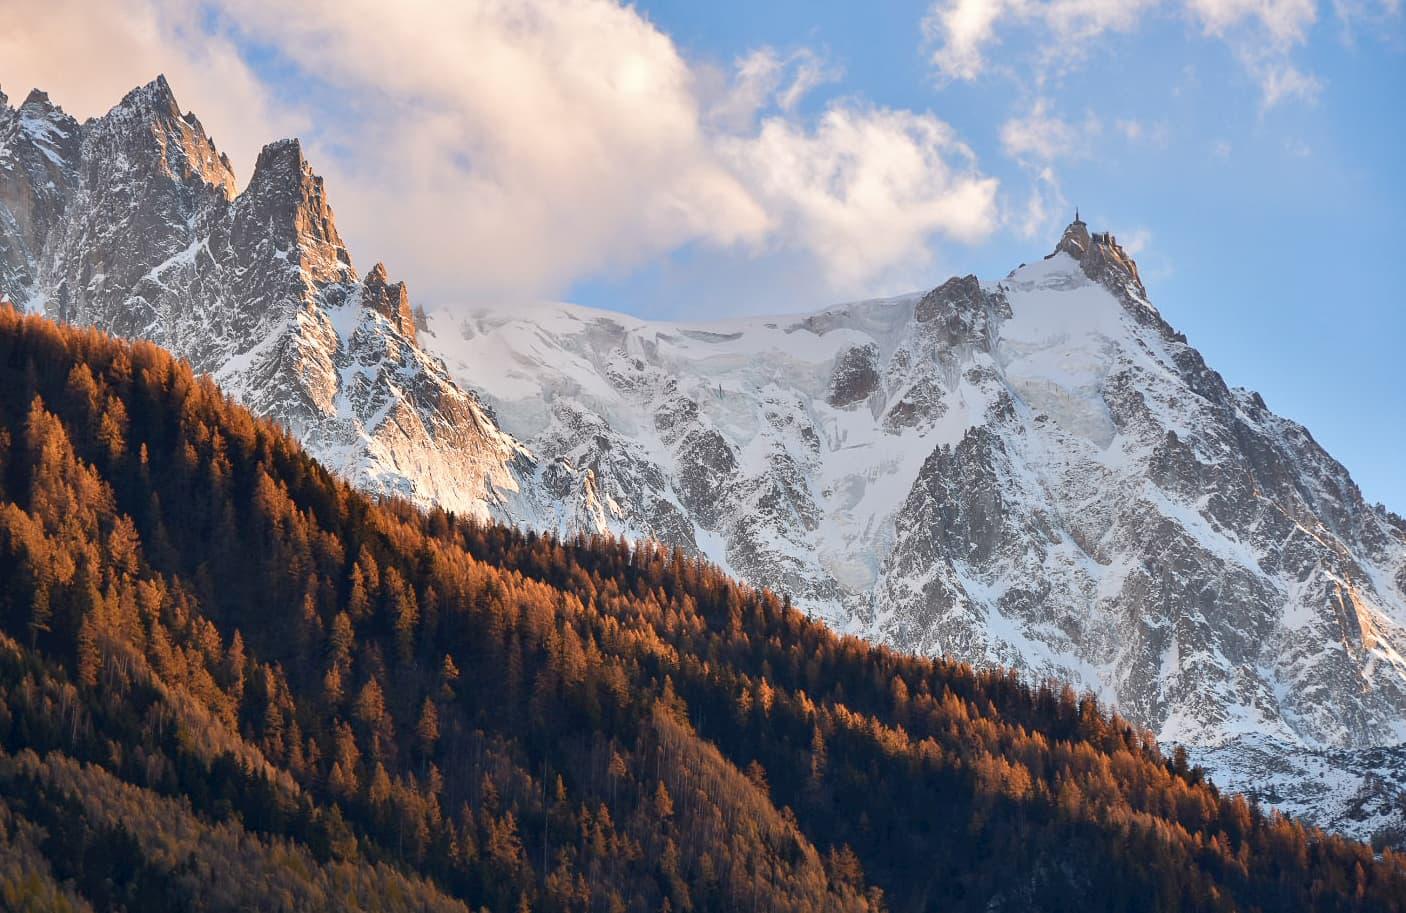 Aiguille du Midi on the right